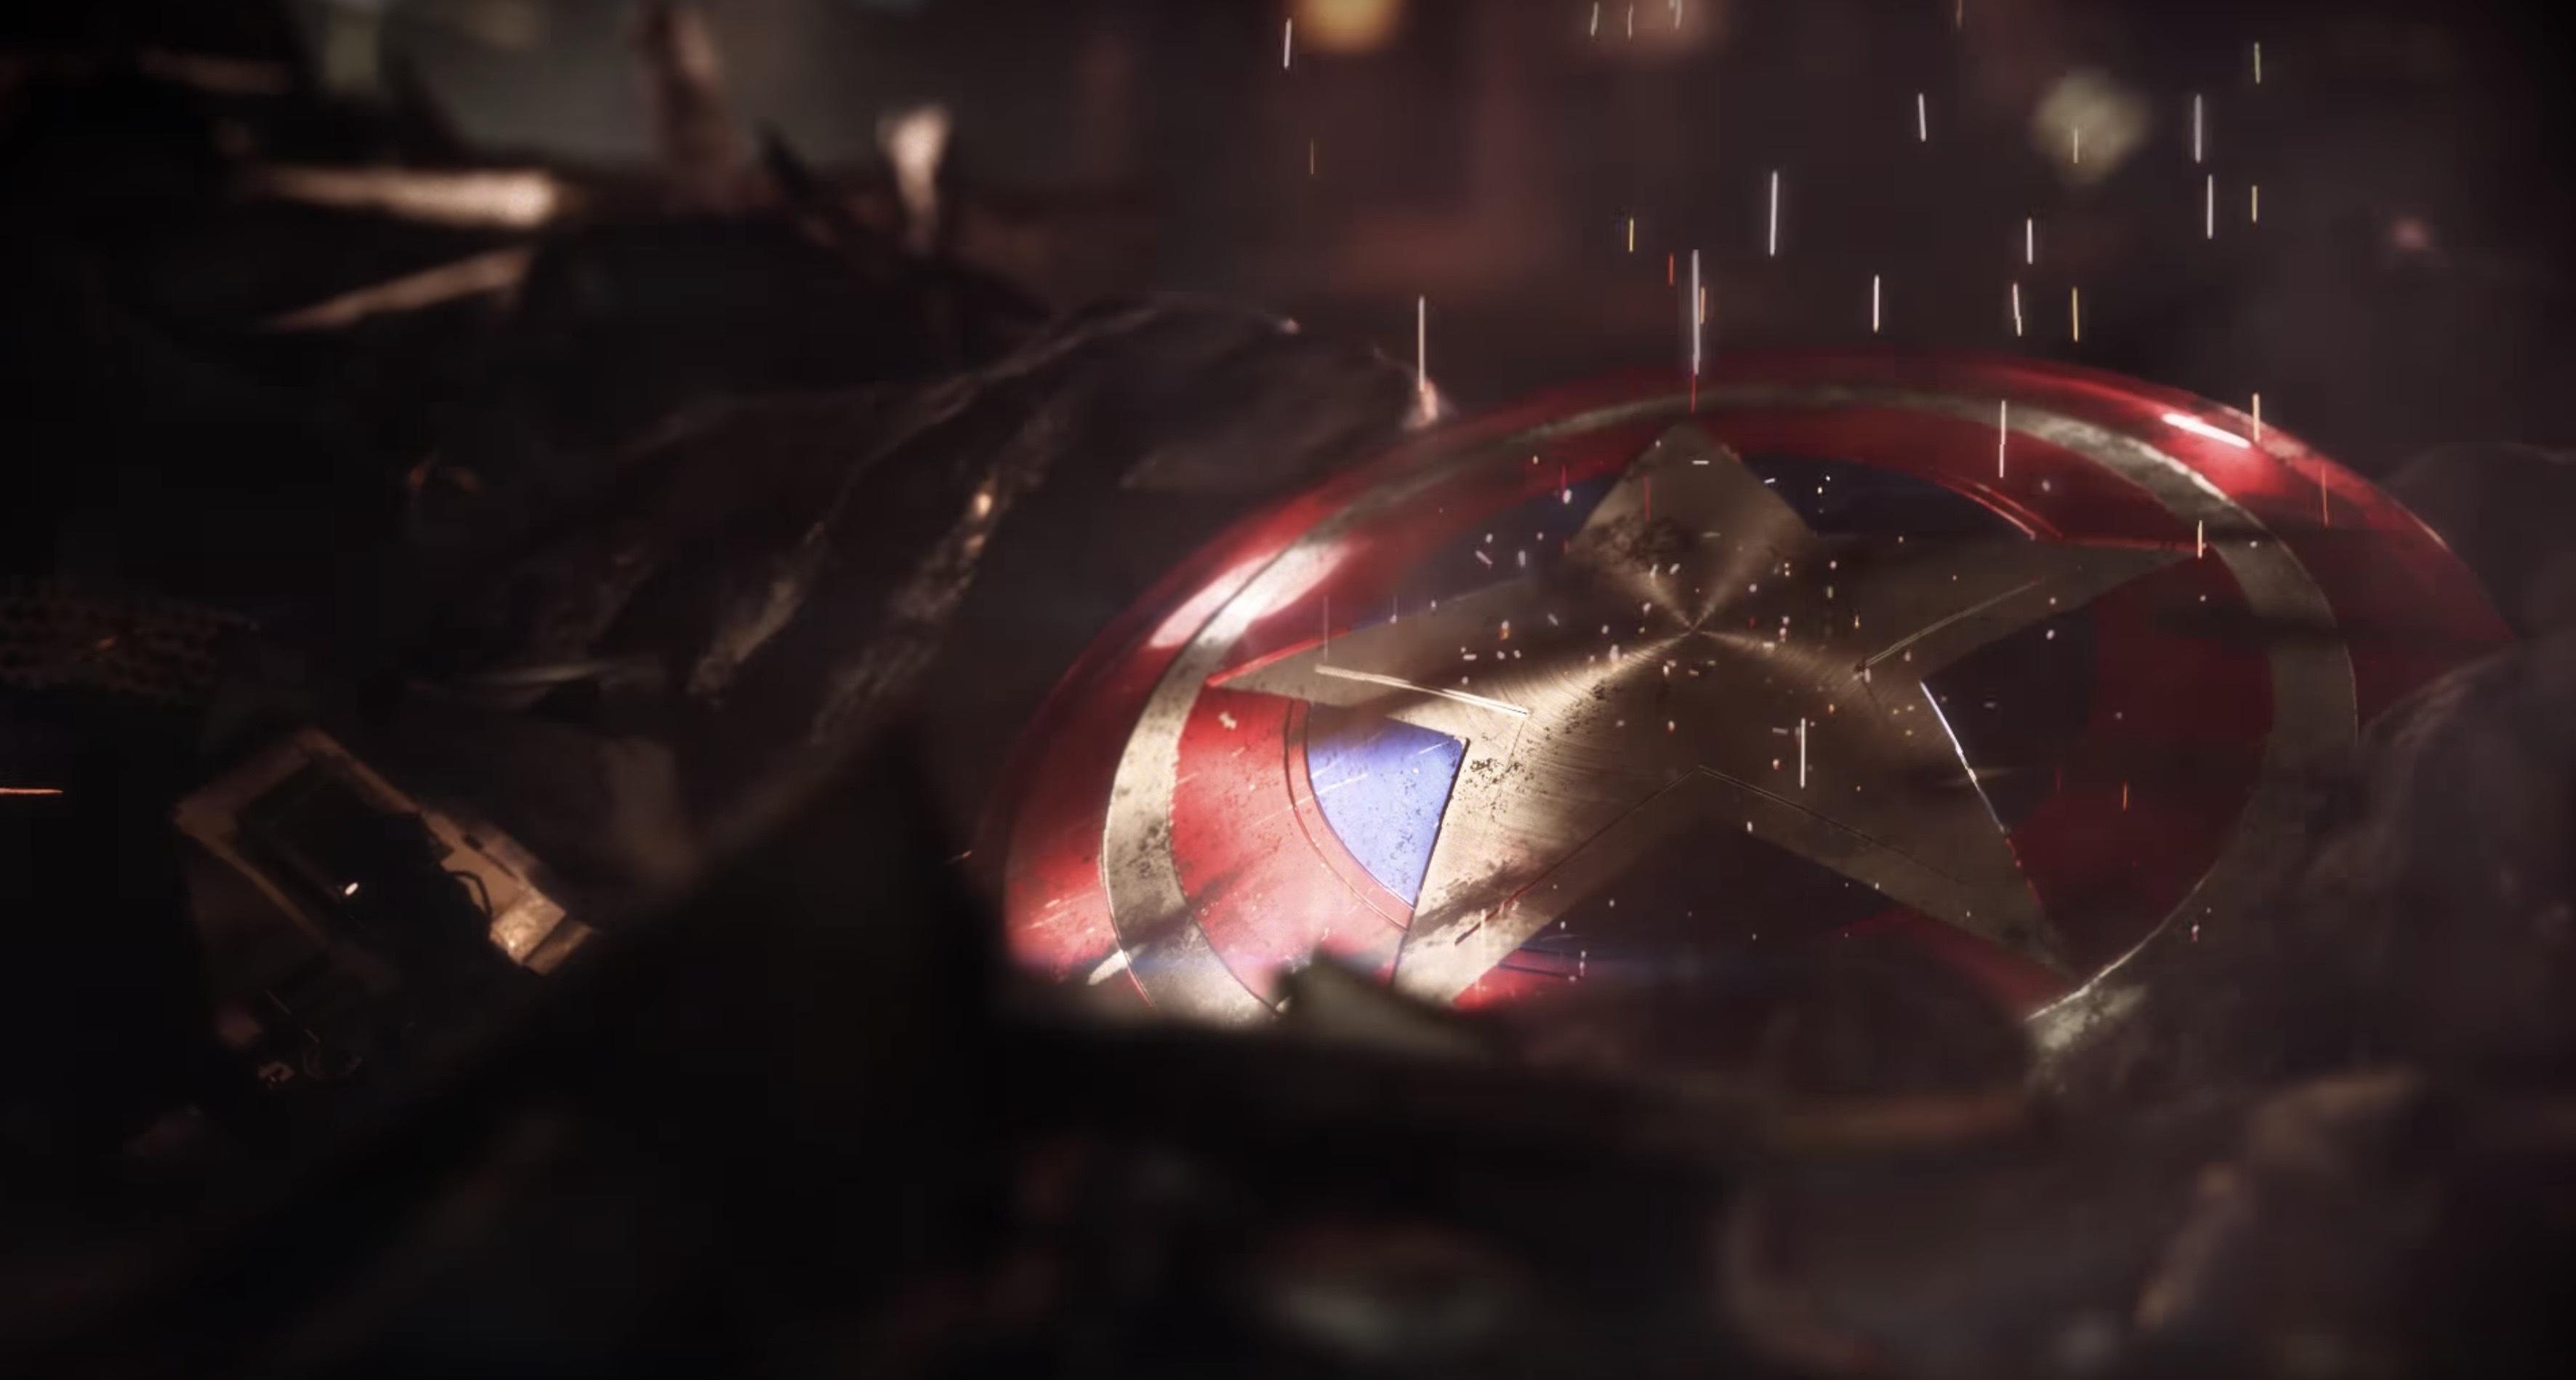 Captain America Shield 4k, HD Movies, 4k Wallpapers ...